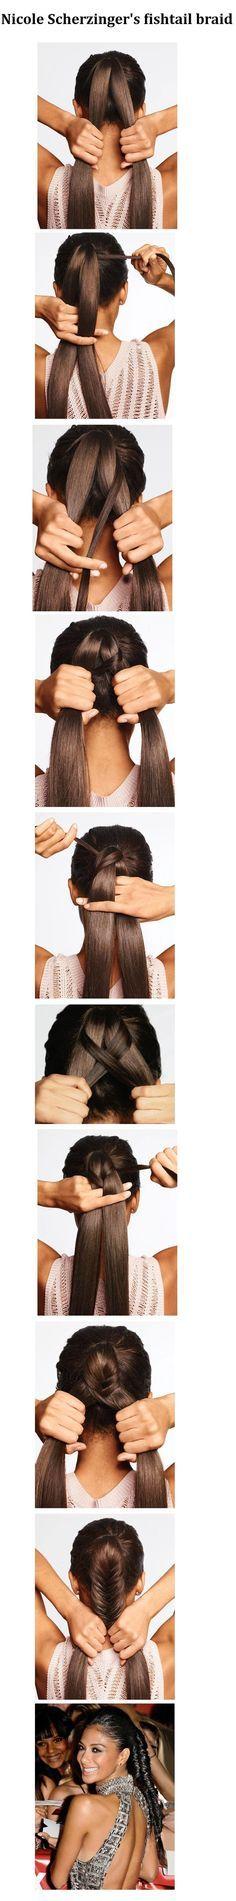 Nicole Scherzinger's fishtail braid #hair #beauty #hairstyles